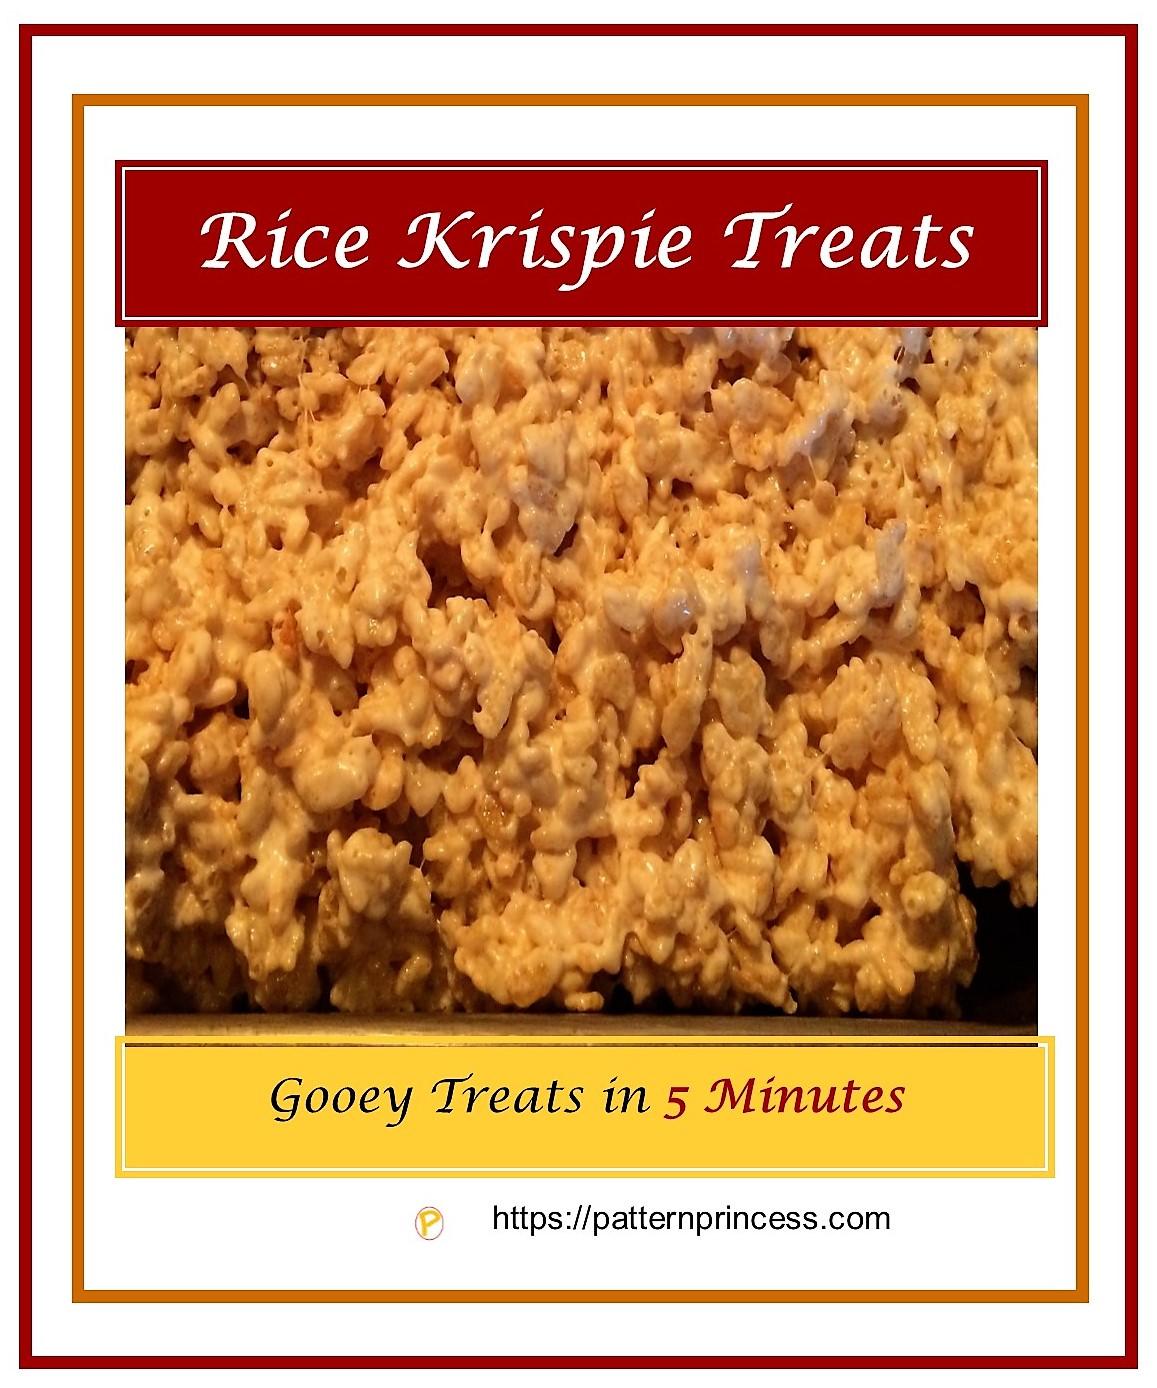 Rice Krispie Treats 1